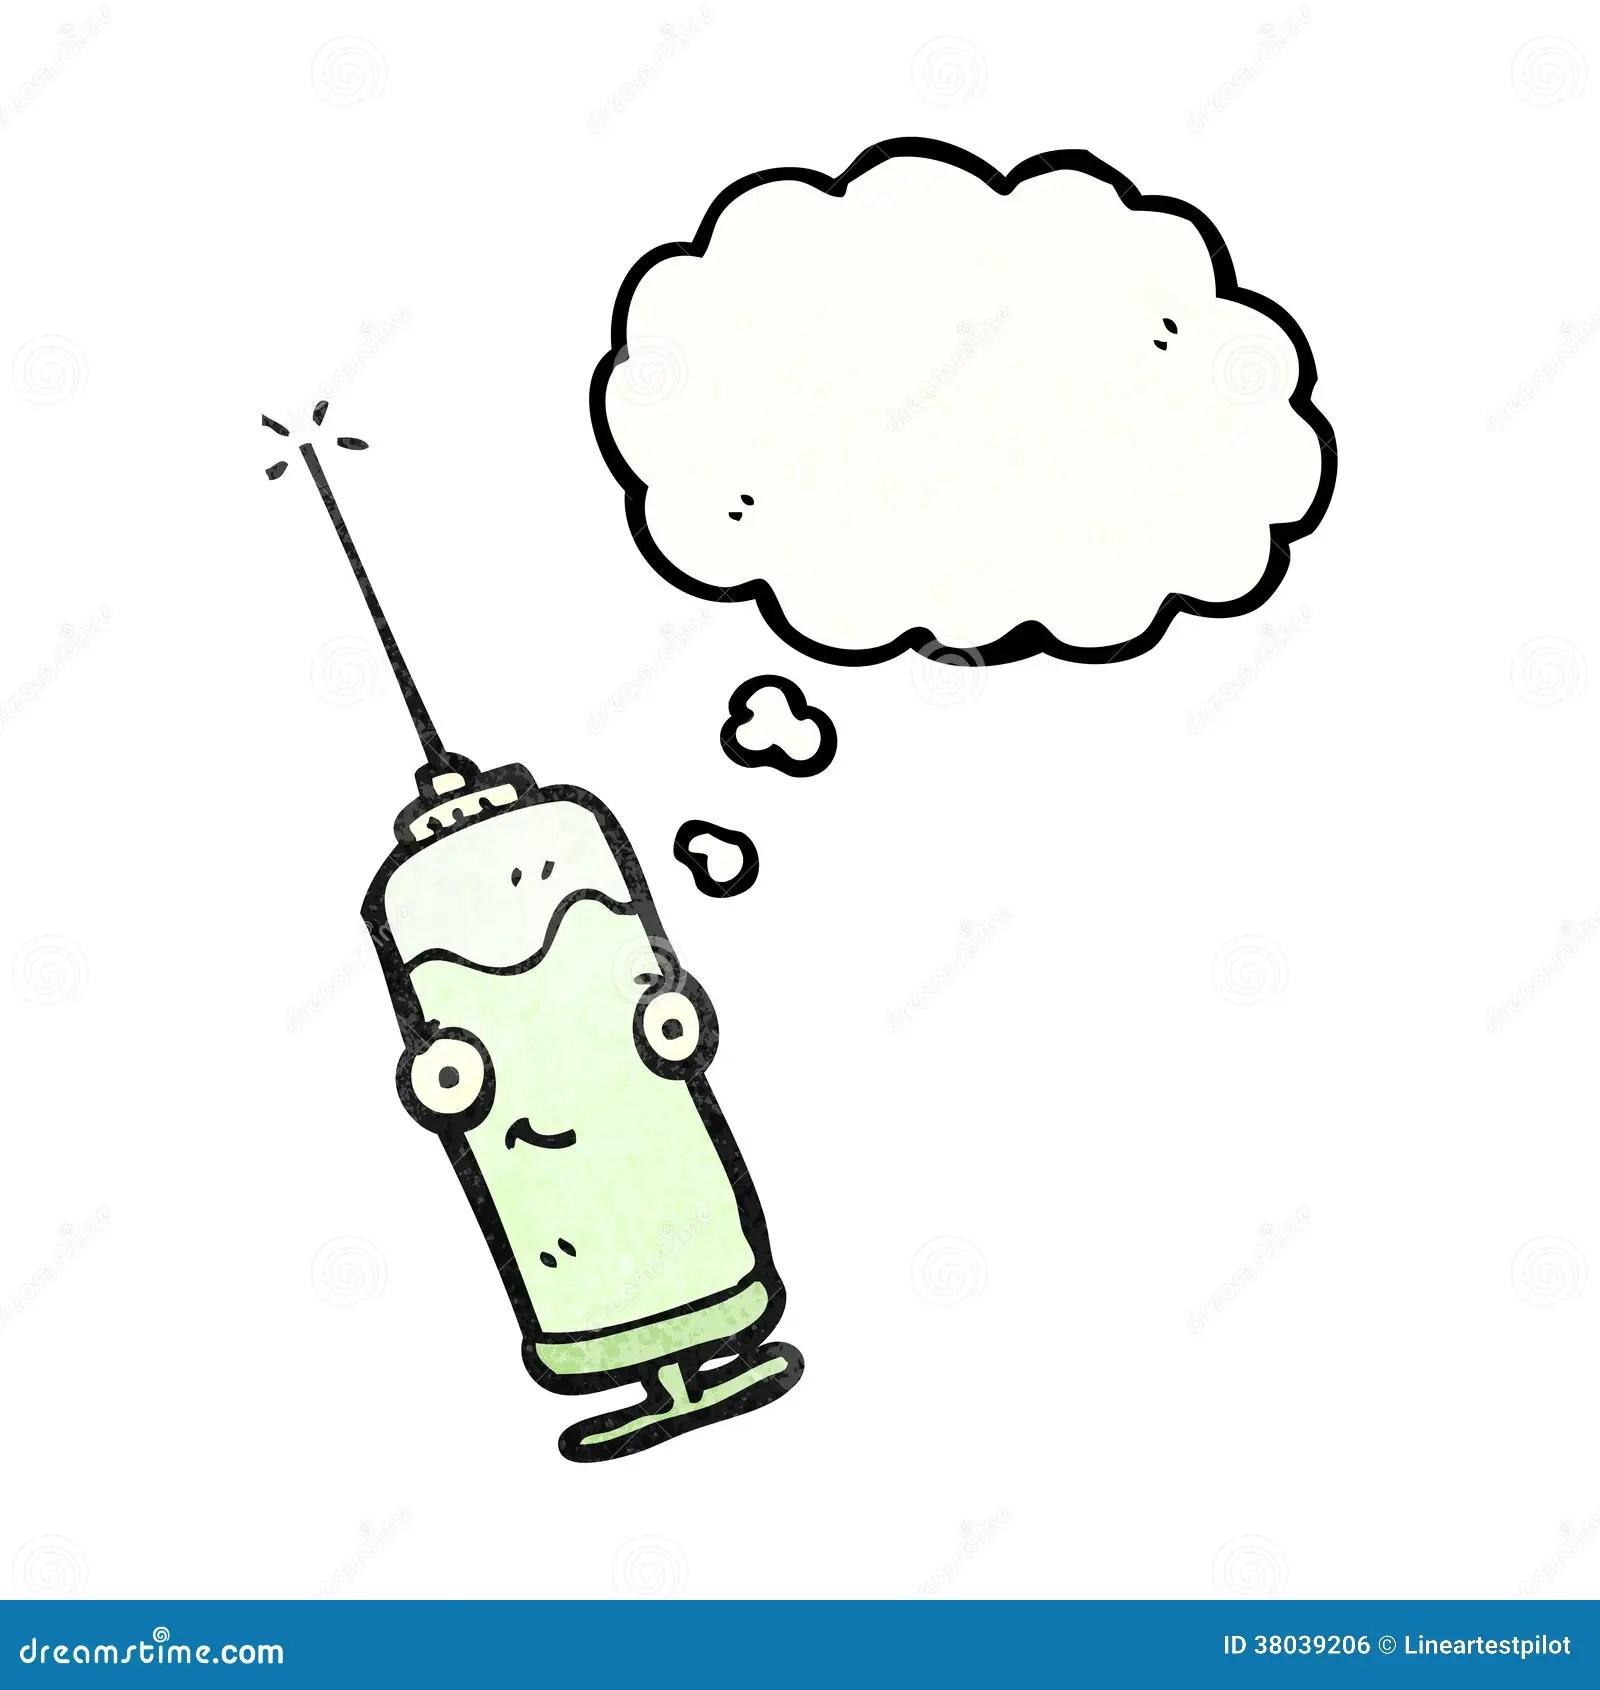 Cartoon Injection Needle Royalty Free Stock Image